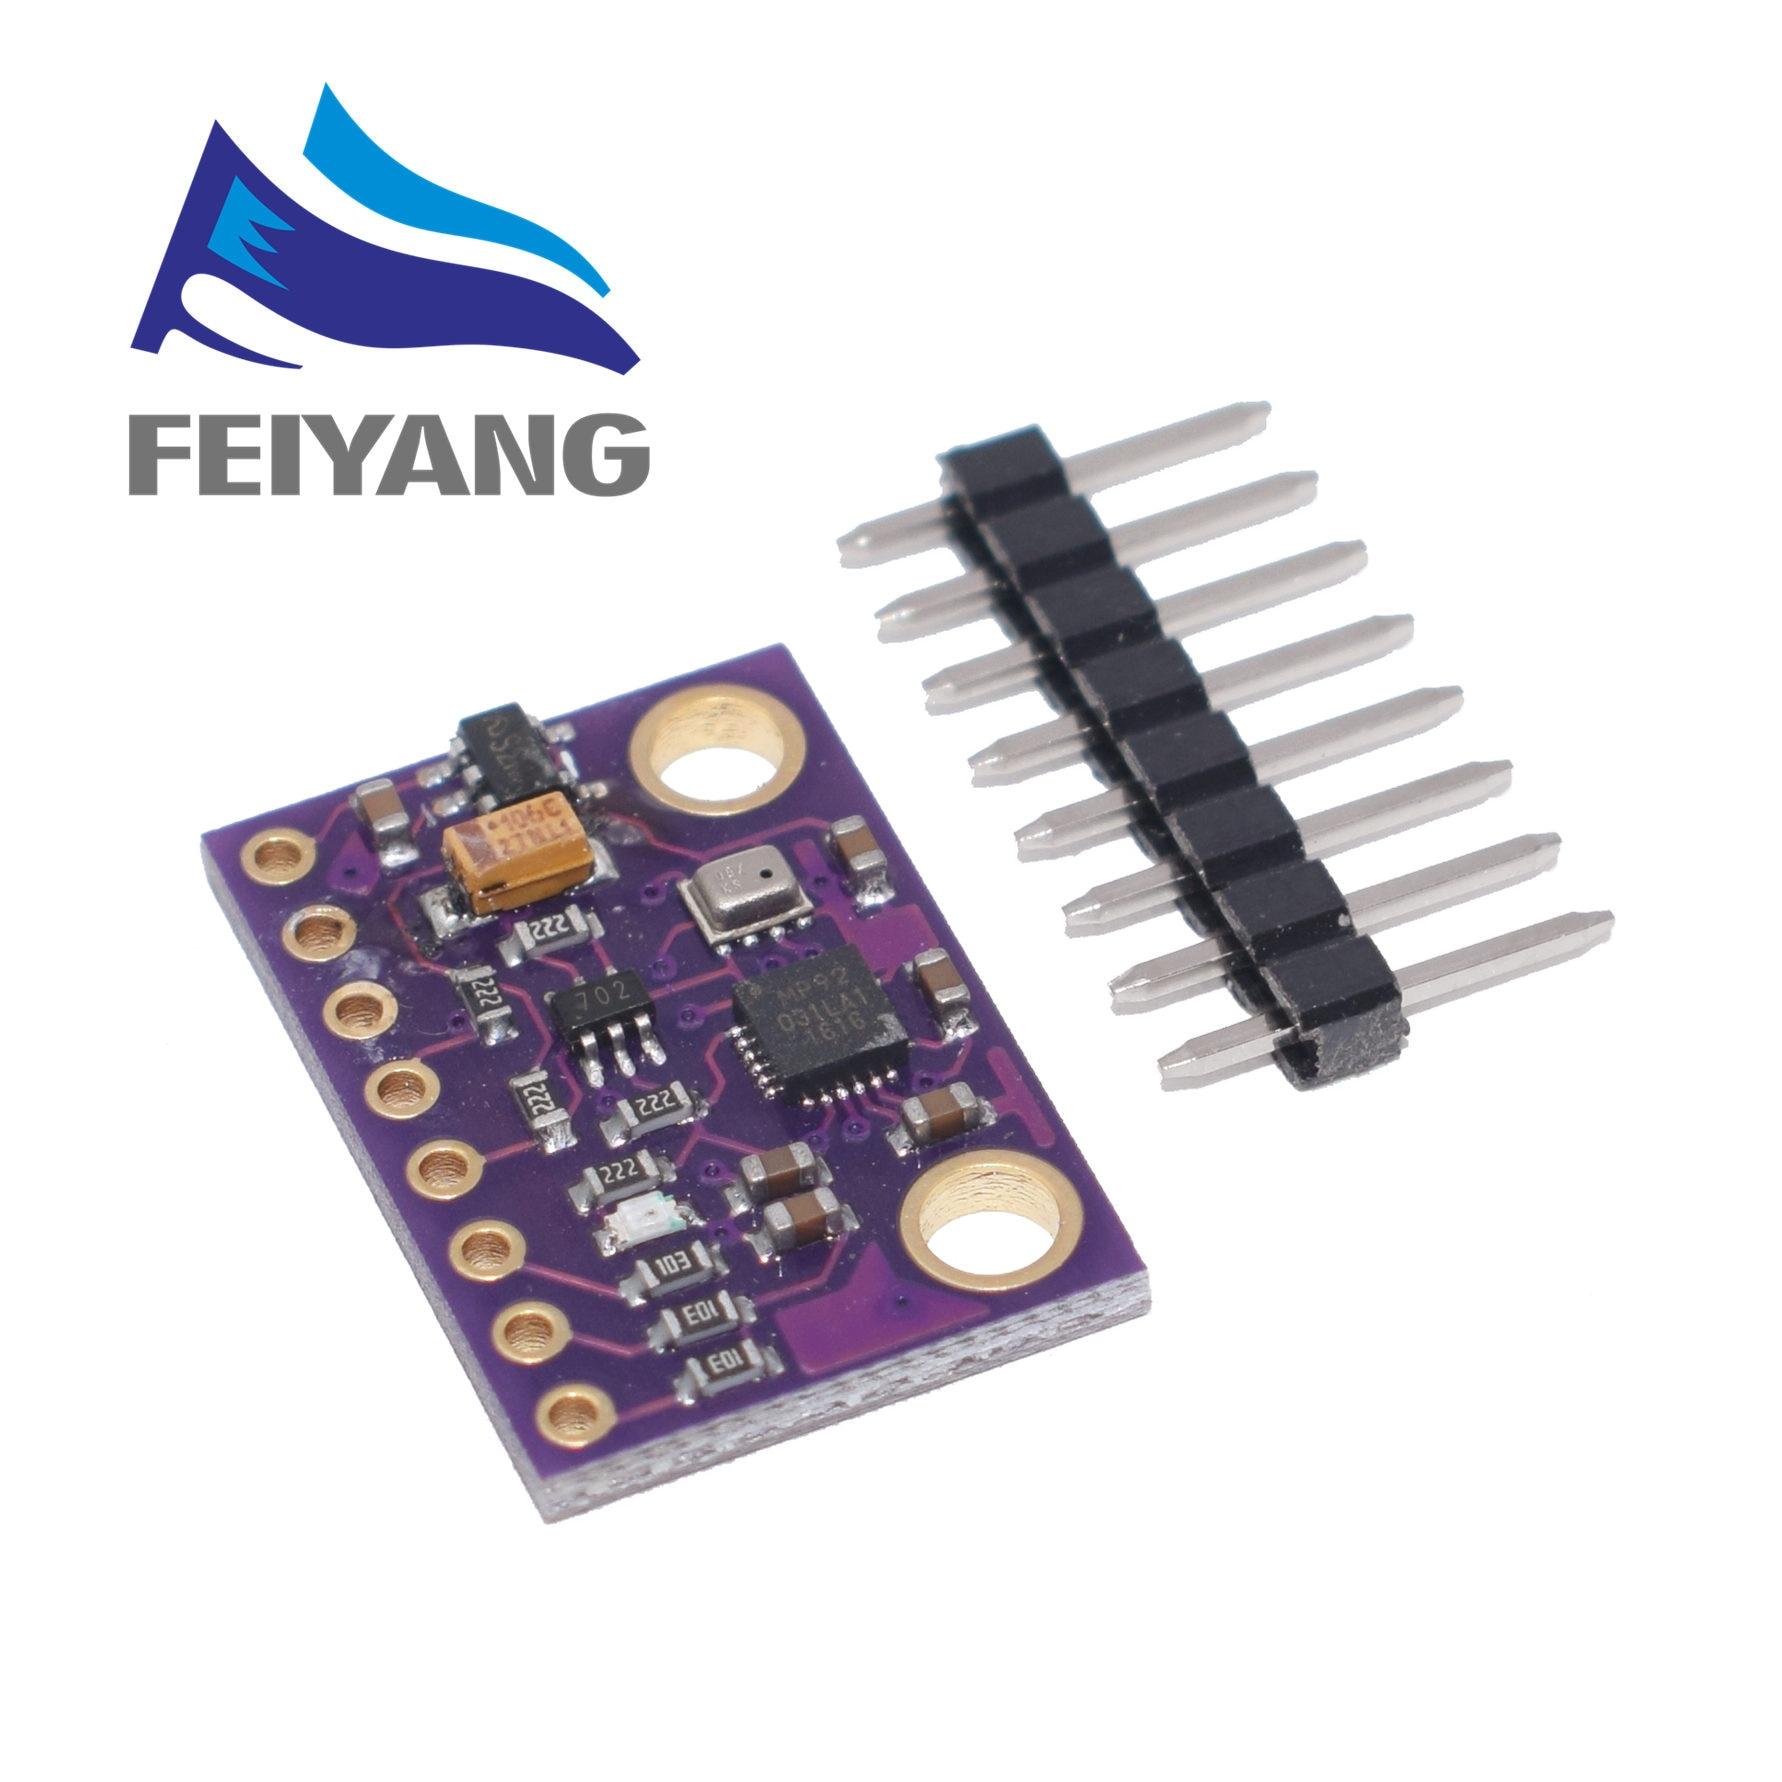 10 Uds MPU-9250 MPU9250 BMP280 SPI IIC/I2C 10DOF aceleración giroscopio brújula 9-Axis placa del Sensor módulo GY-91 para Arduino 3-5V